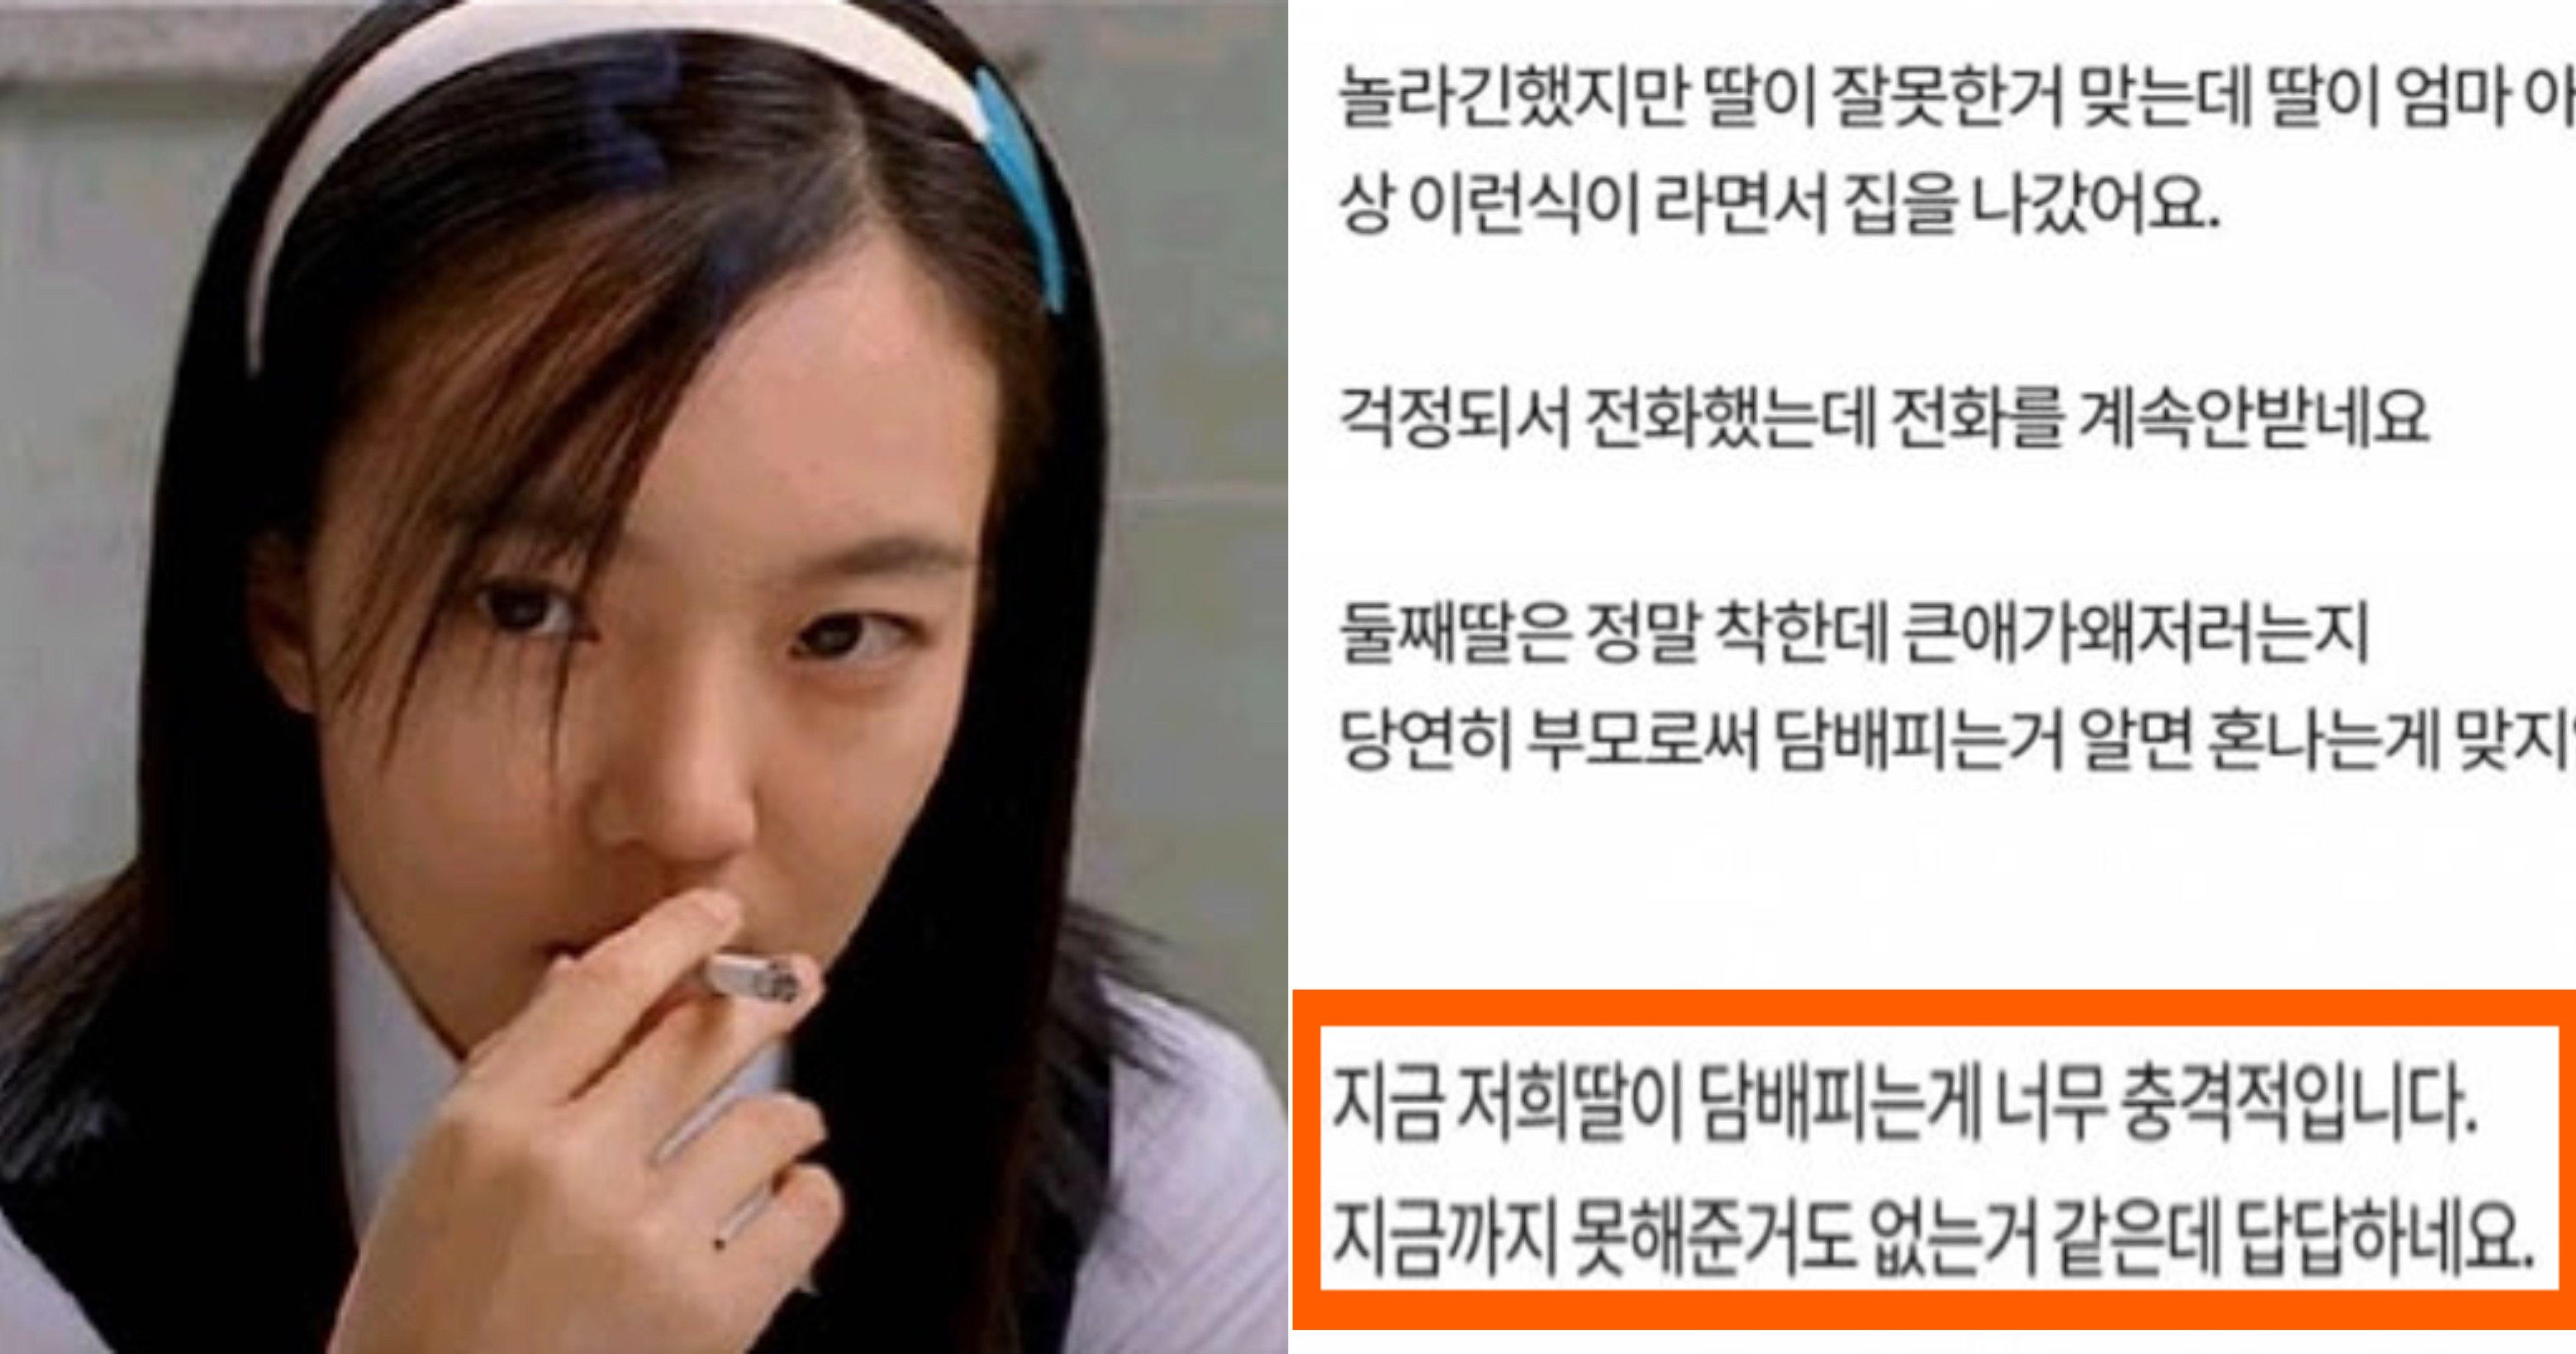 "kakaotalk 20210501 001442898.jpg?resize=1200,630 - ""딸이 남편에게 담배를 걸렸습니다""... 딸이 아빠에게 담배피다 걸린 최후"